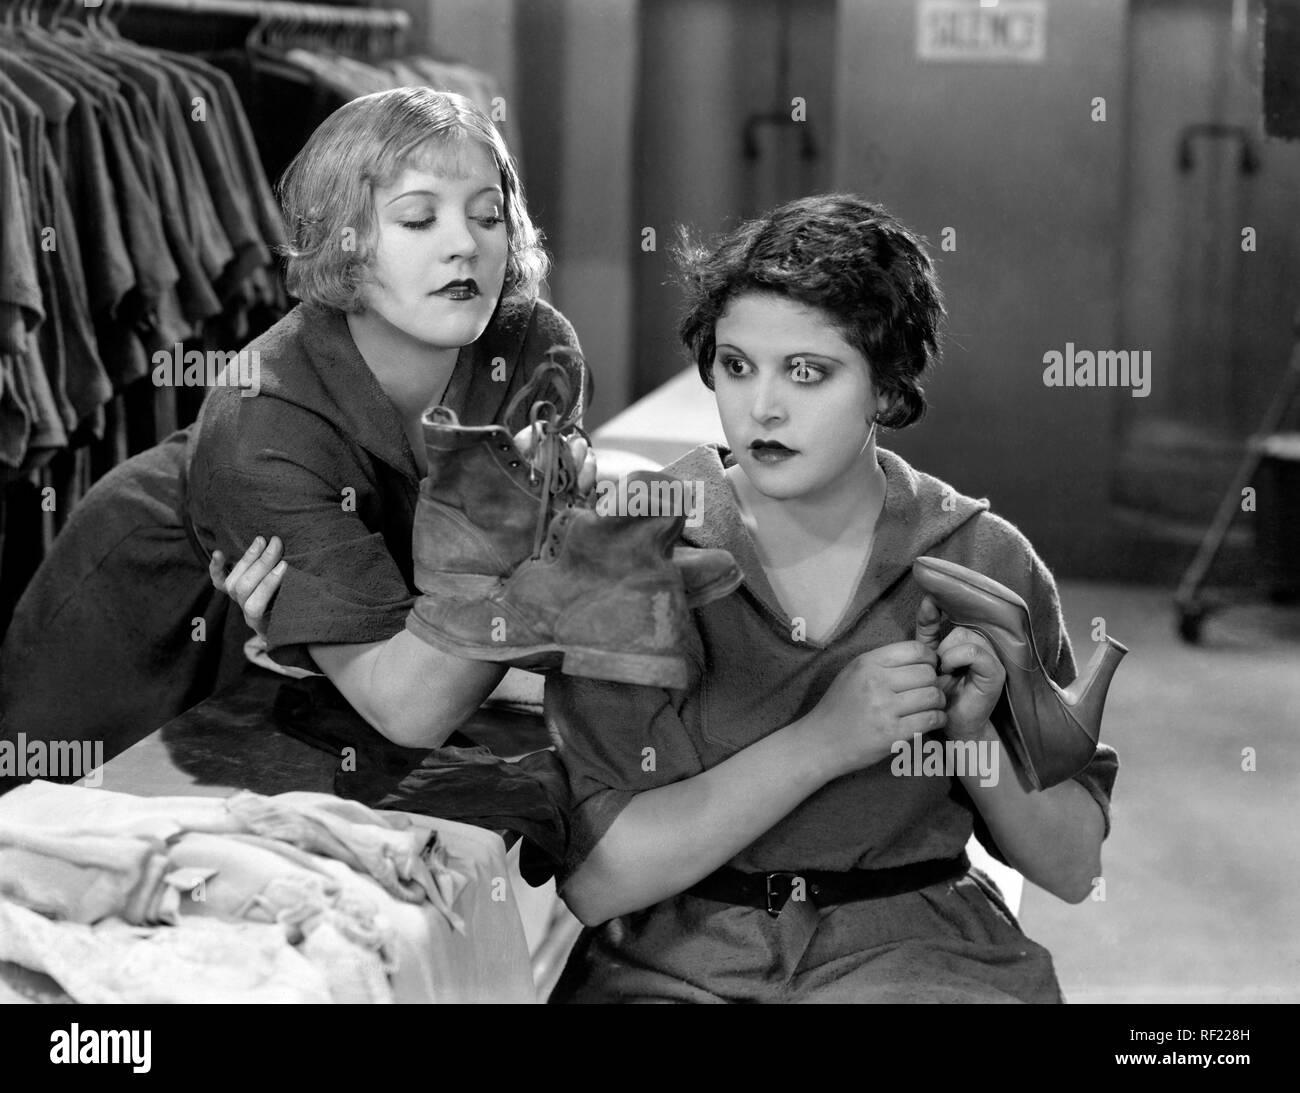 Prod DB © C.B. DeMille Productions / DR LES DAMNES DU COEUR THE GODLESS GIRL de Cecil B. DeMille 1929 USA Marie Prevost Lina Basquette. film muet; silent film; chaussures; shoes - Stock Image